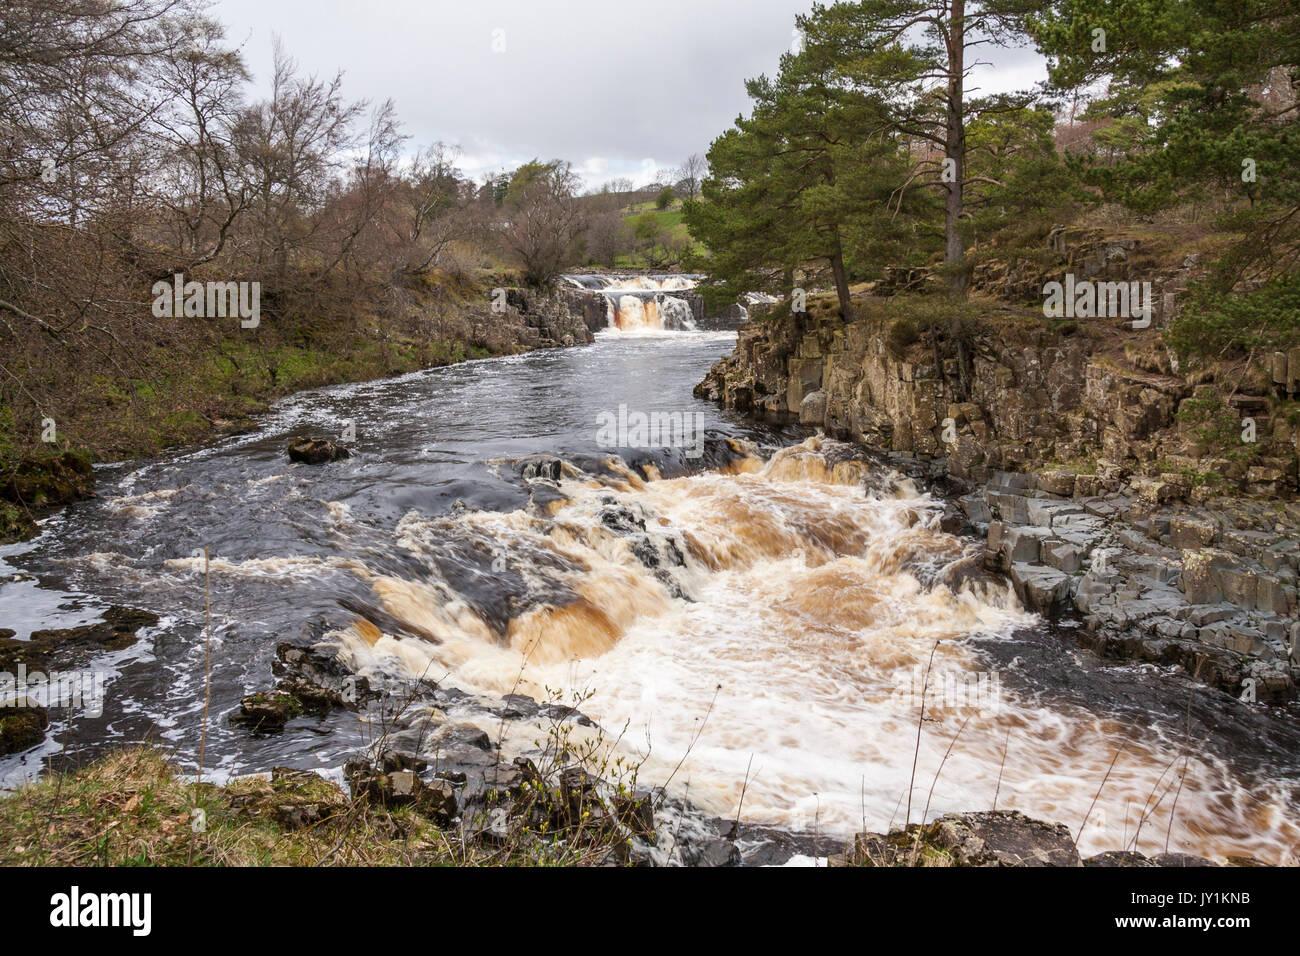 Waterfalls at Low Force,Bowlees,Teesdale,England,UK - Stock Image